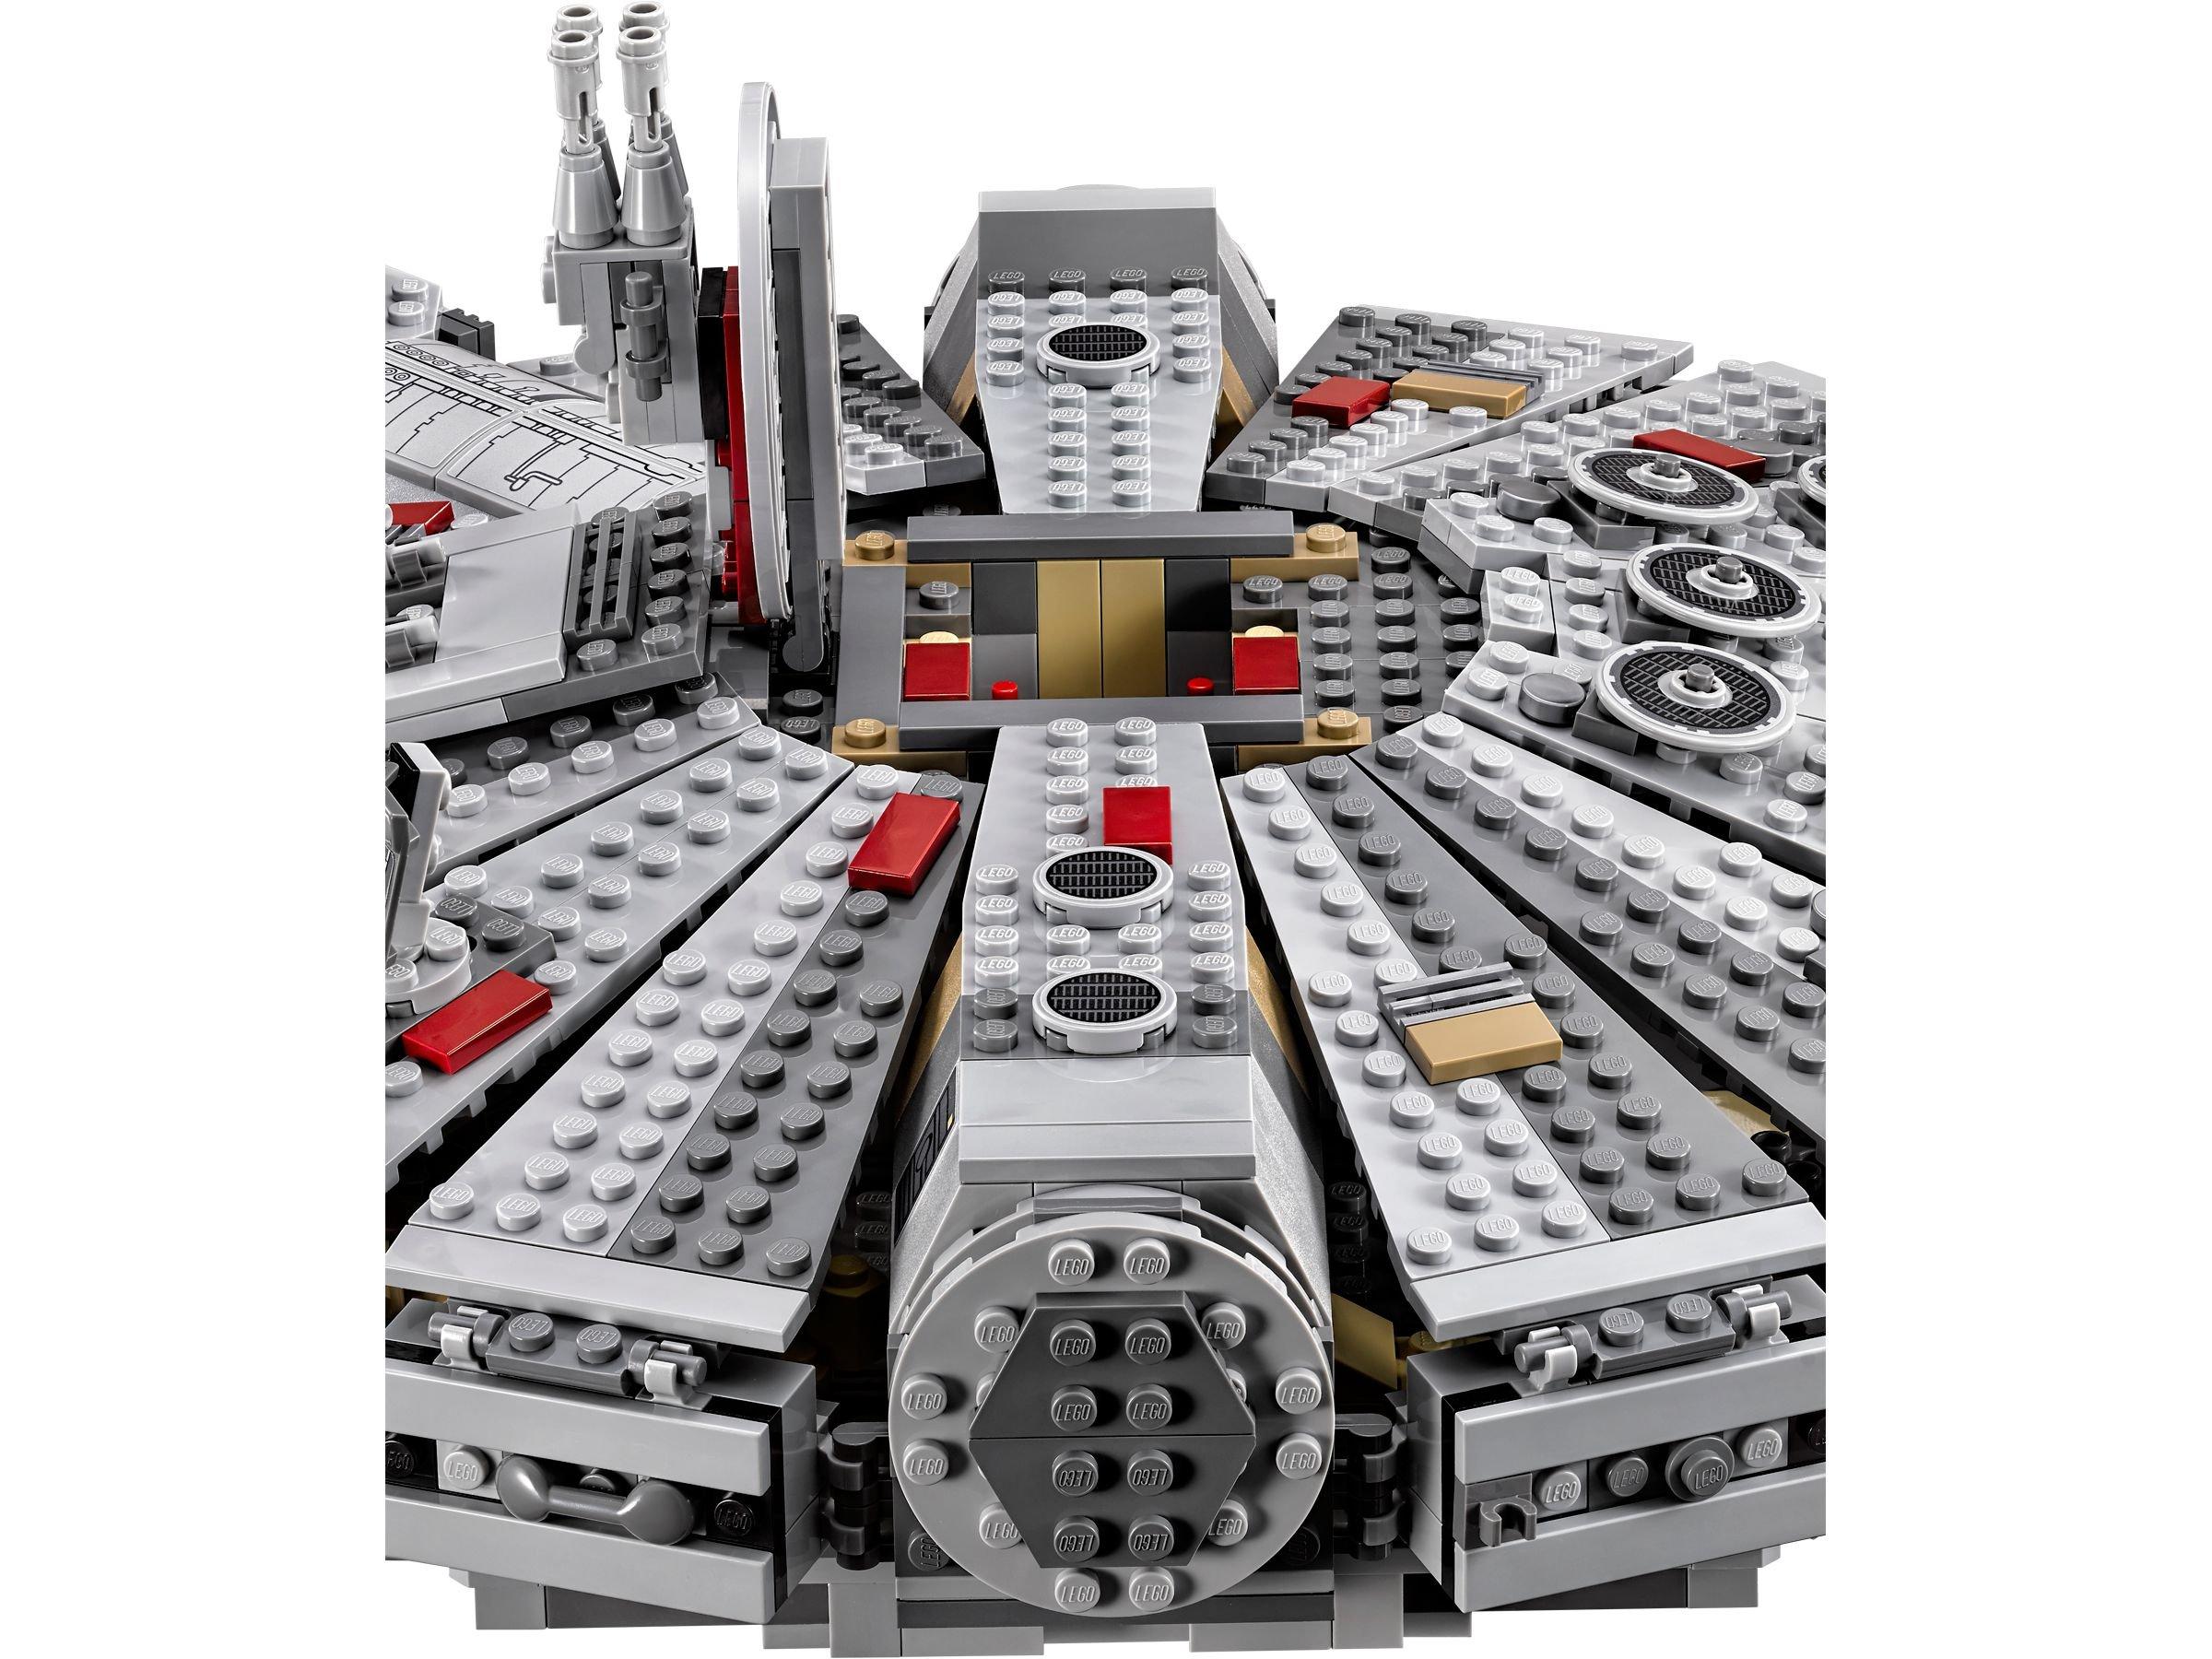 lego 75105 millennium falcon star wars 2015 brickmerge. Black Bedroom Furniture Sets. Home Design Ideas